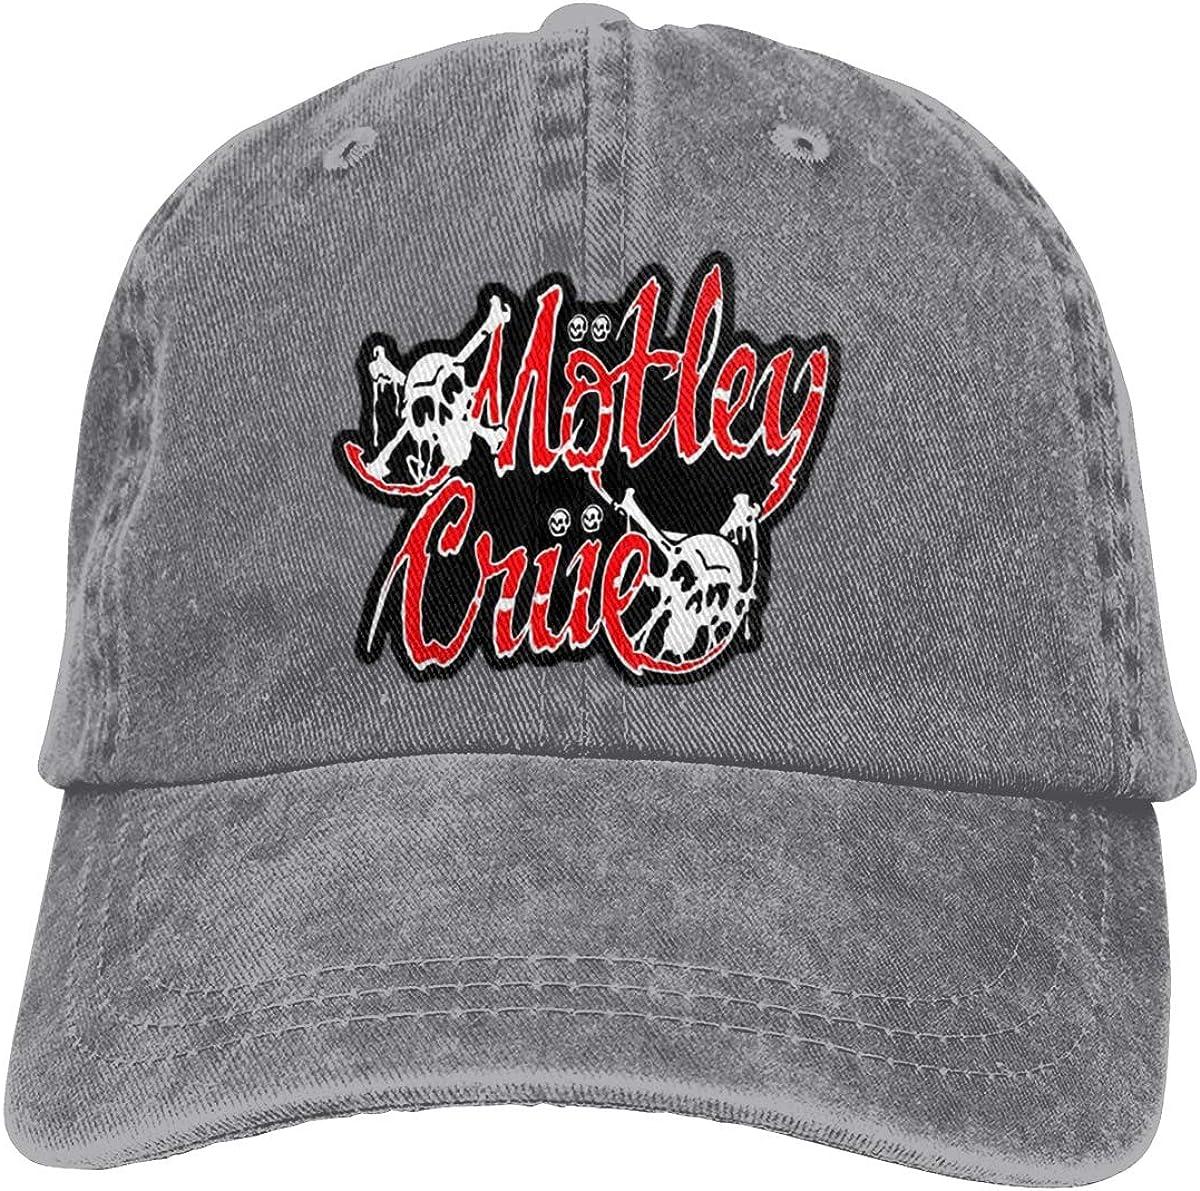 Zlizhi Motley-Crue Men Women Plain Cotton Adjustable Washed Twill Low Profile Baseball Cap Hat